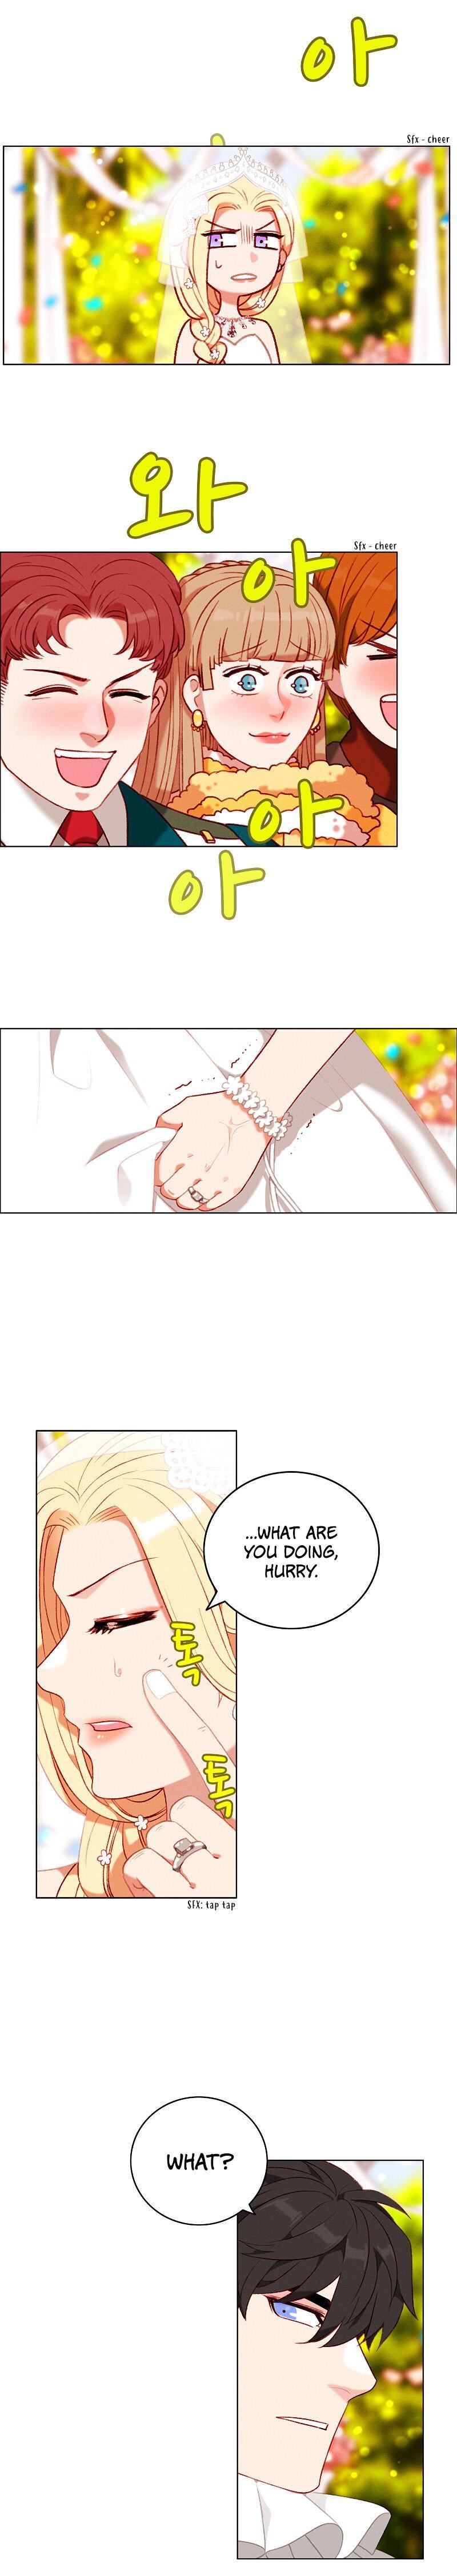 Living As The Tyrant's Older Sister Chapter 93 page 3 - Mangakakalots.com